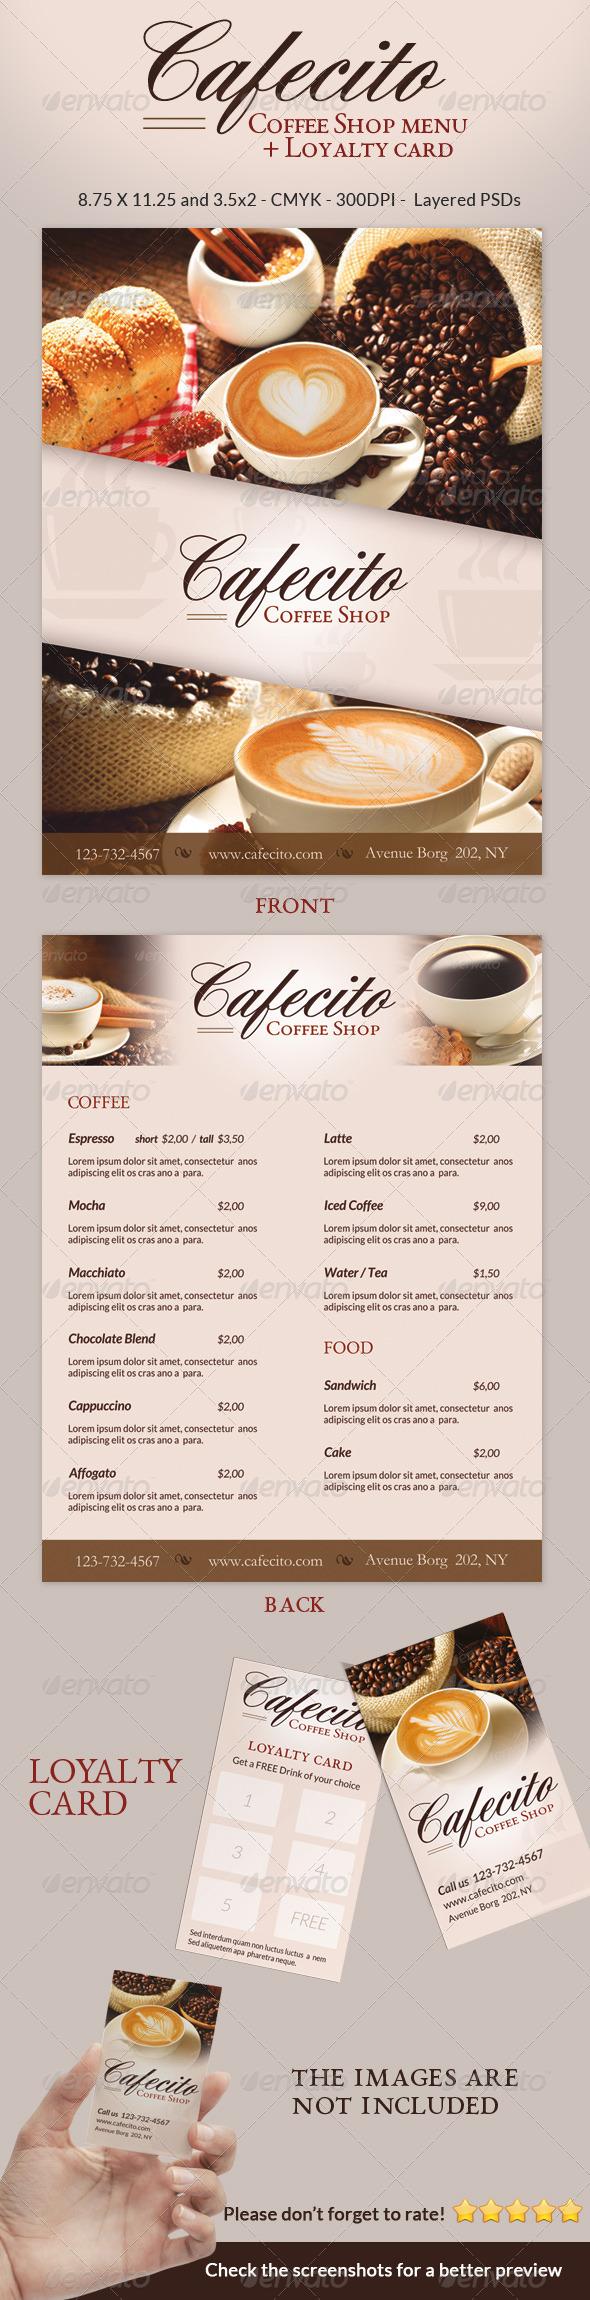 Cafecito Coffee Shop Menu + Loyalty Card - Food Menus Print Templates